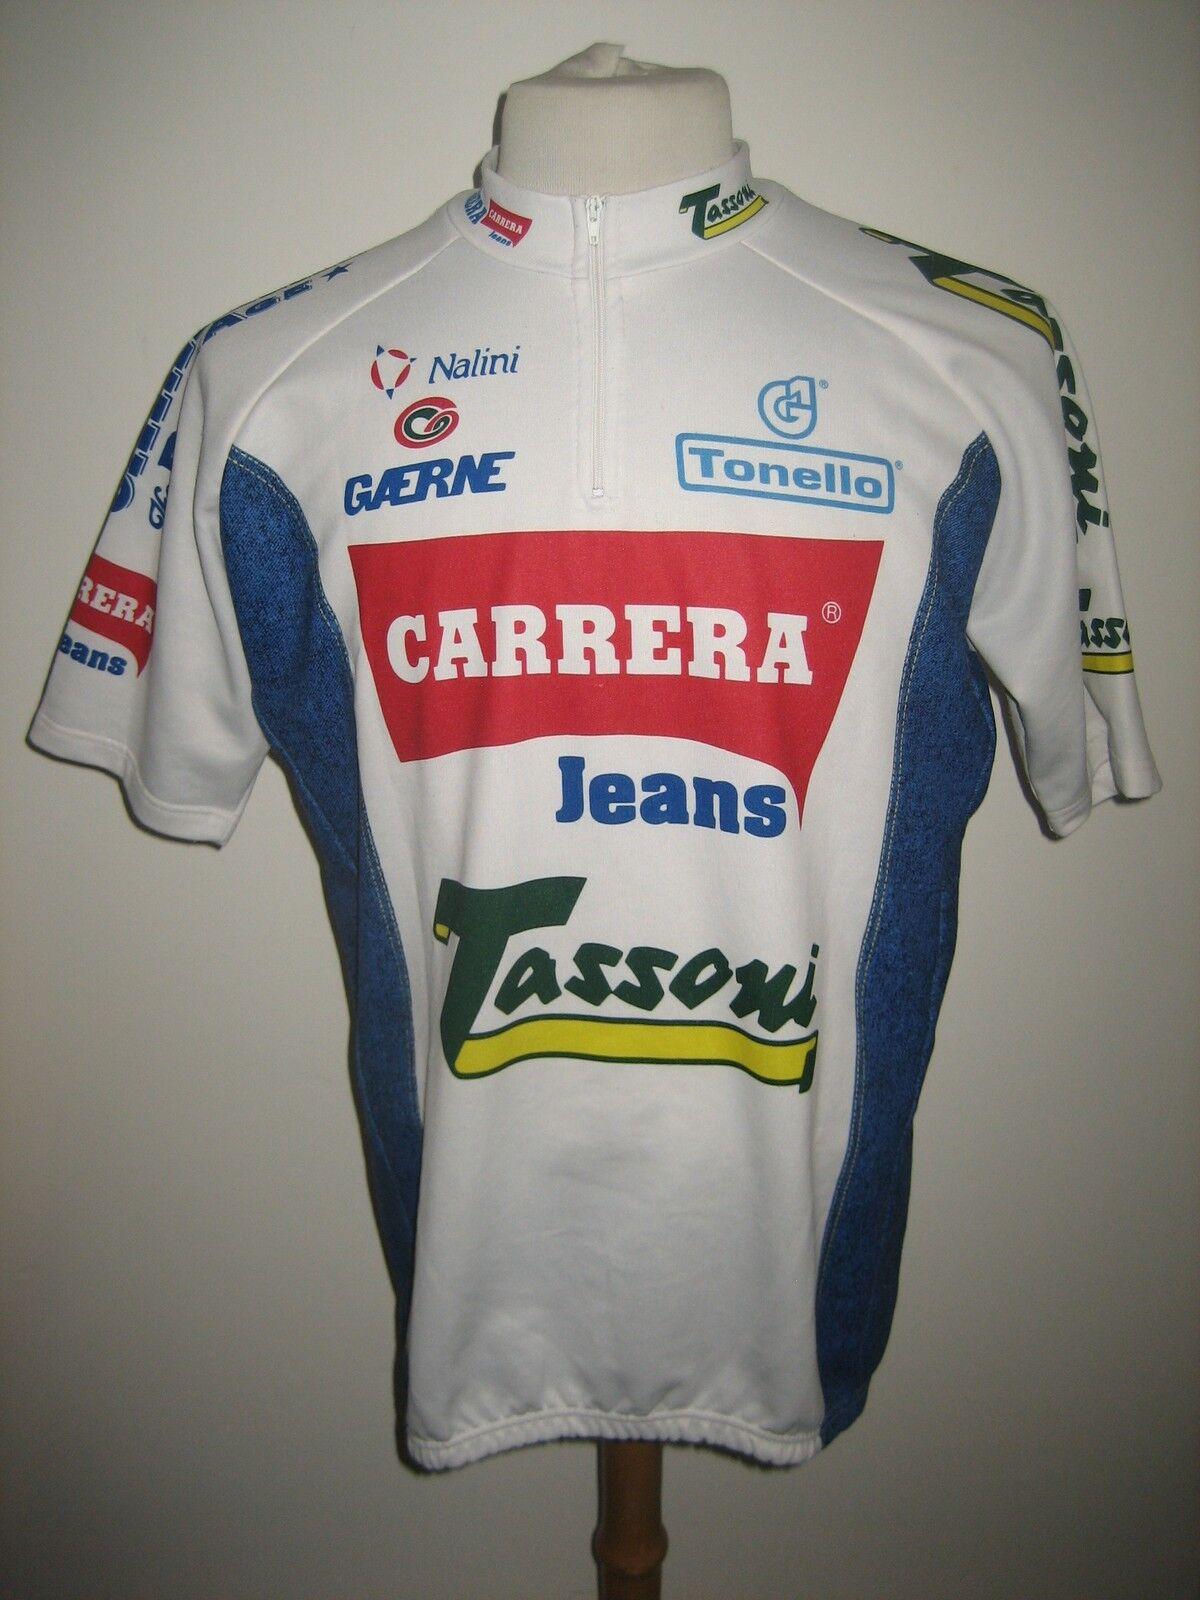 Carrera Jeans Tassoni  vintage 90's jersey shirt cycling maglia size XXL